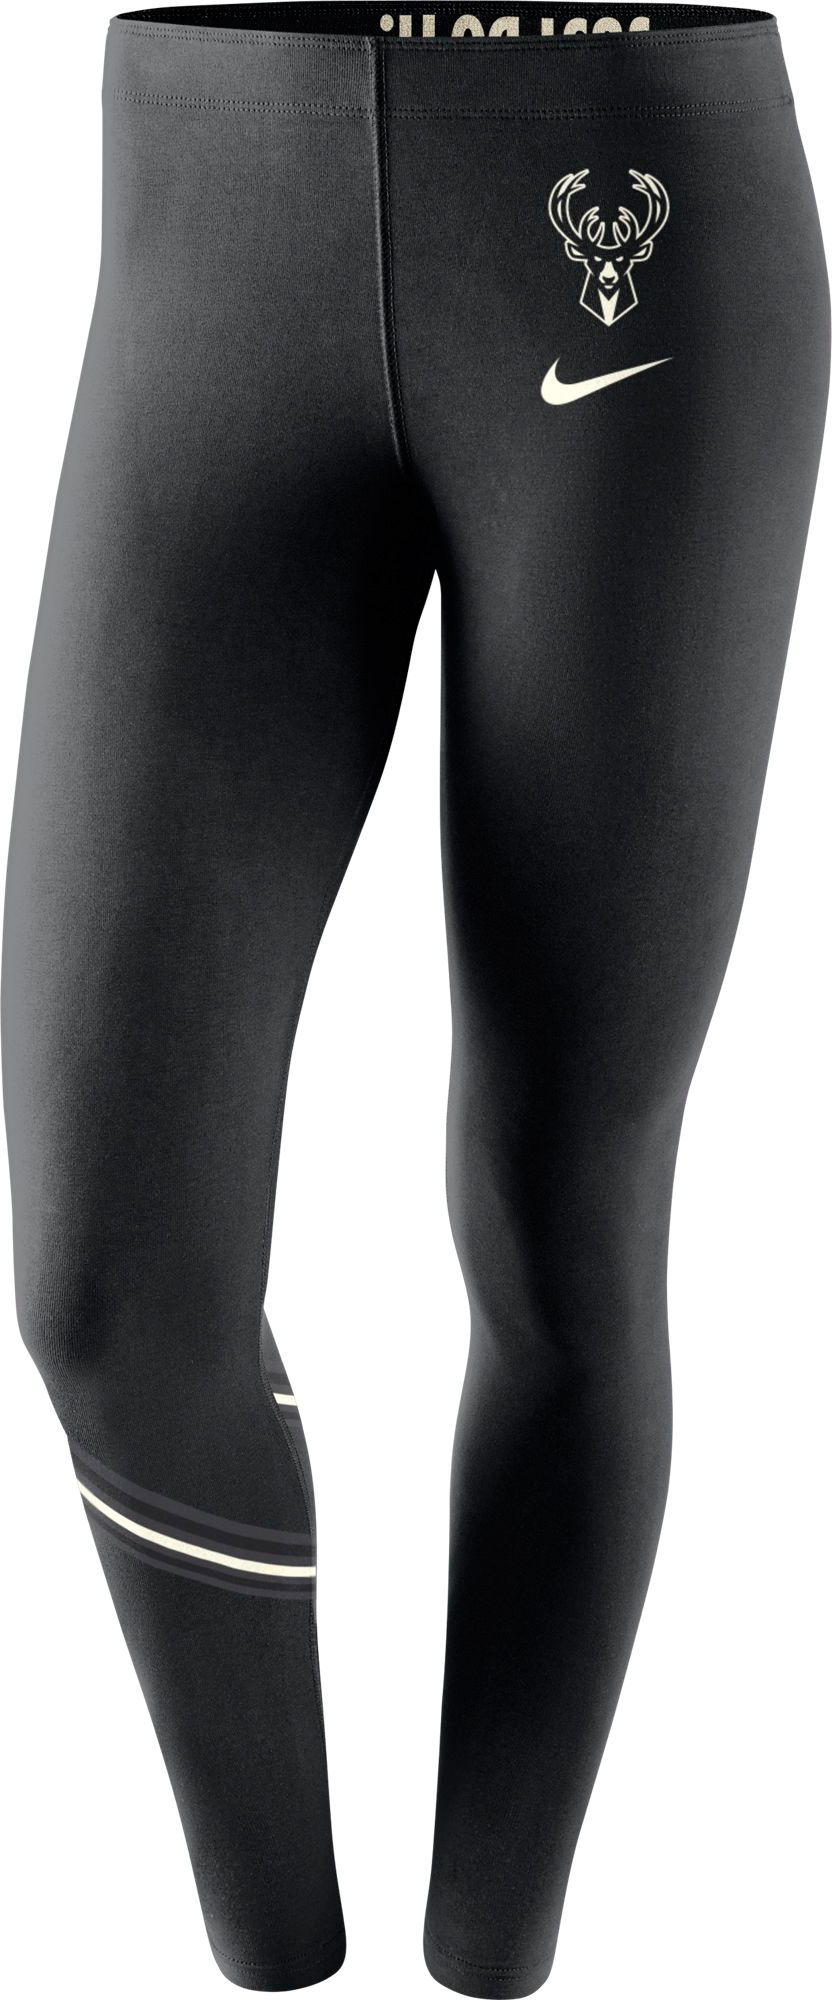 promo code 3de29 b2d3f Nike Women's Milwaukee Bucks Black Leggings | Products ...